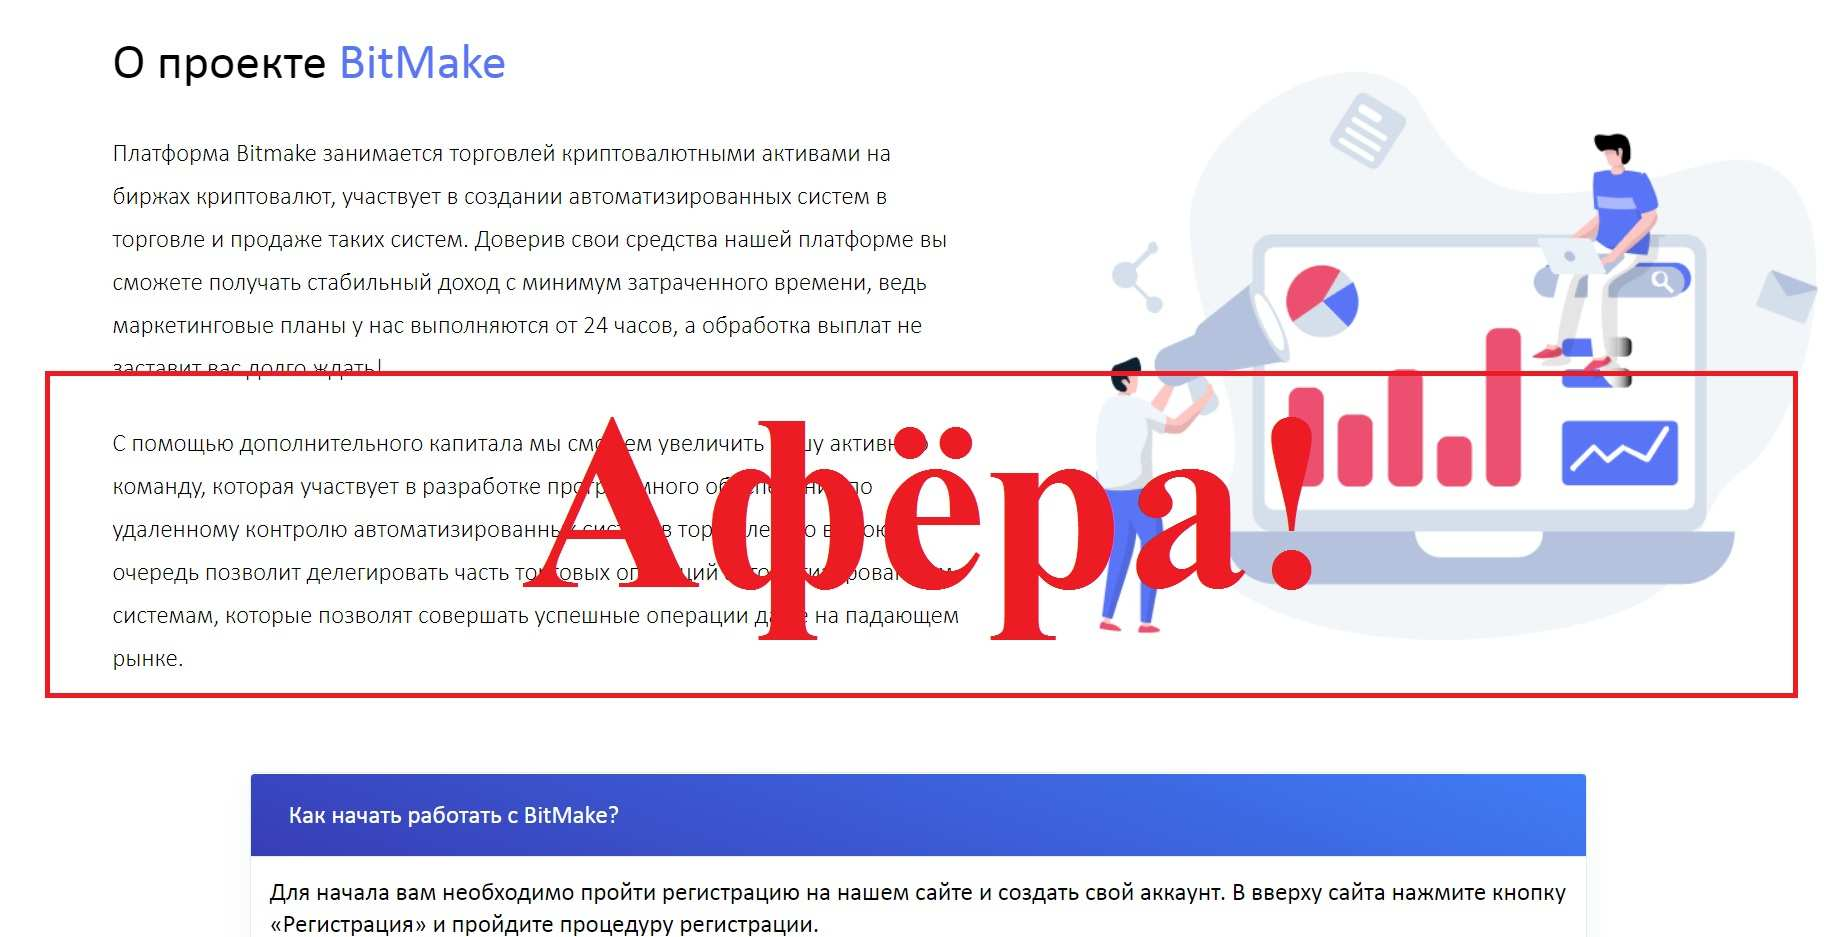 Bitmake.biz – отзывы и обзор bitmake.biz